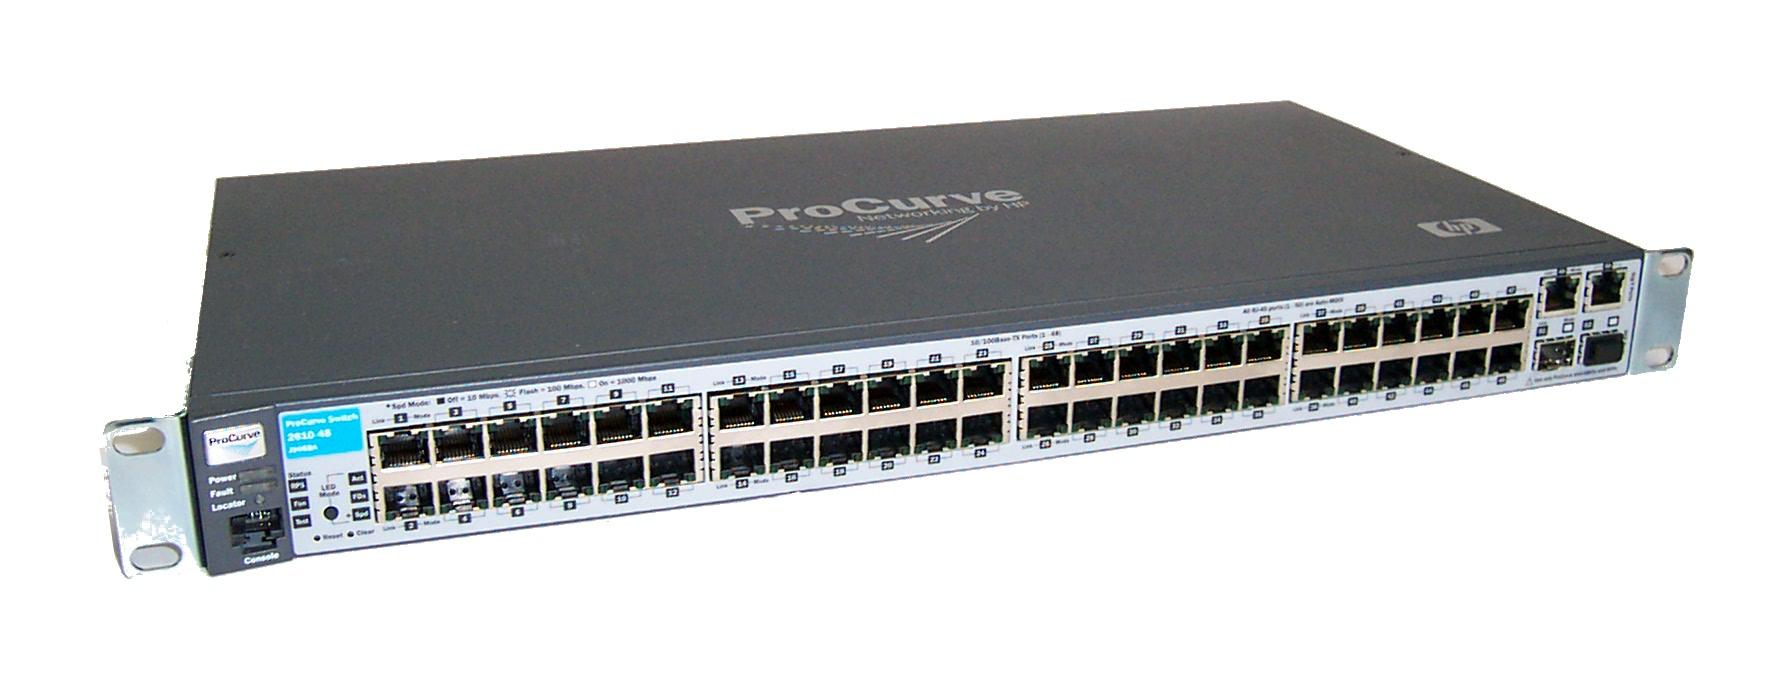 hp procurve j9088a 2610 48 48 port gigabit ethernet nw